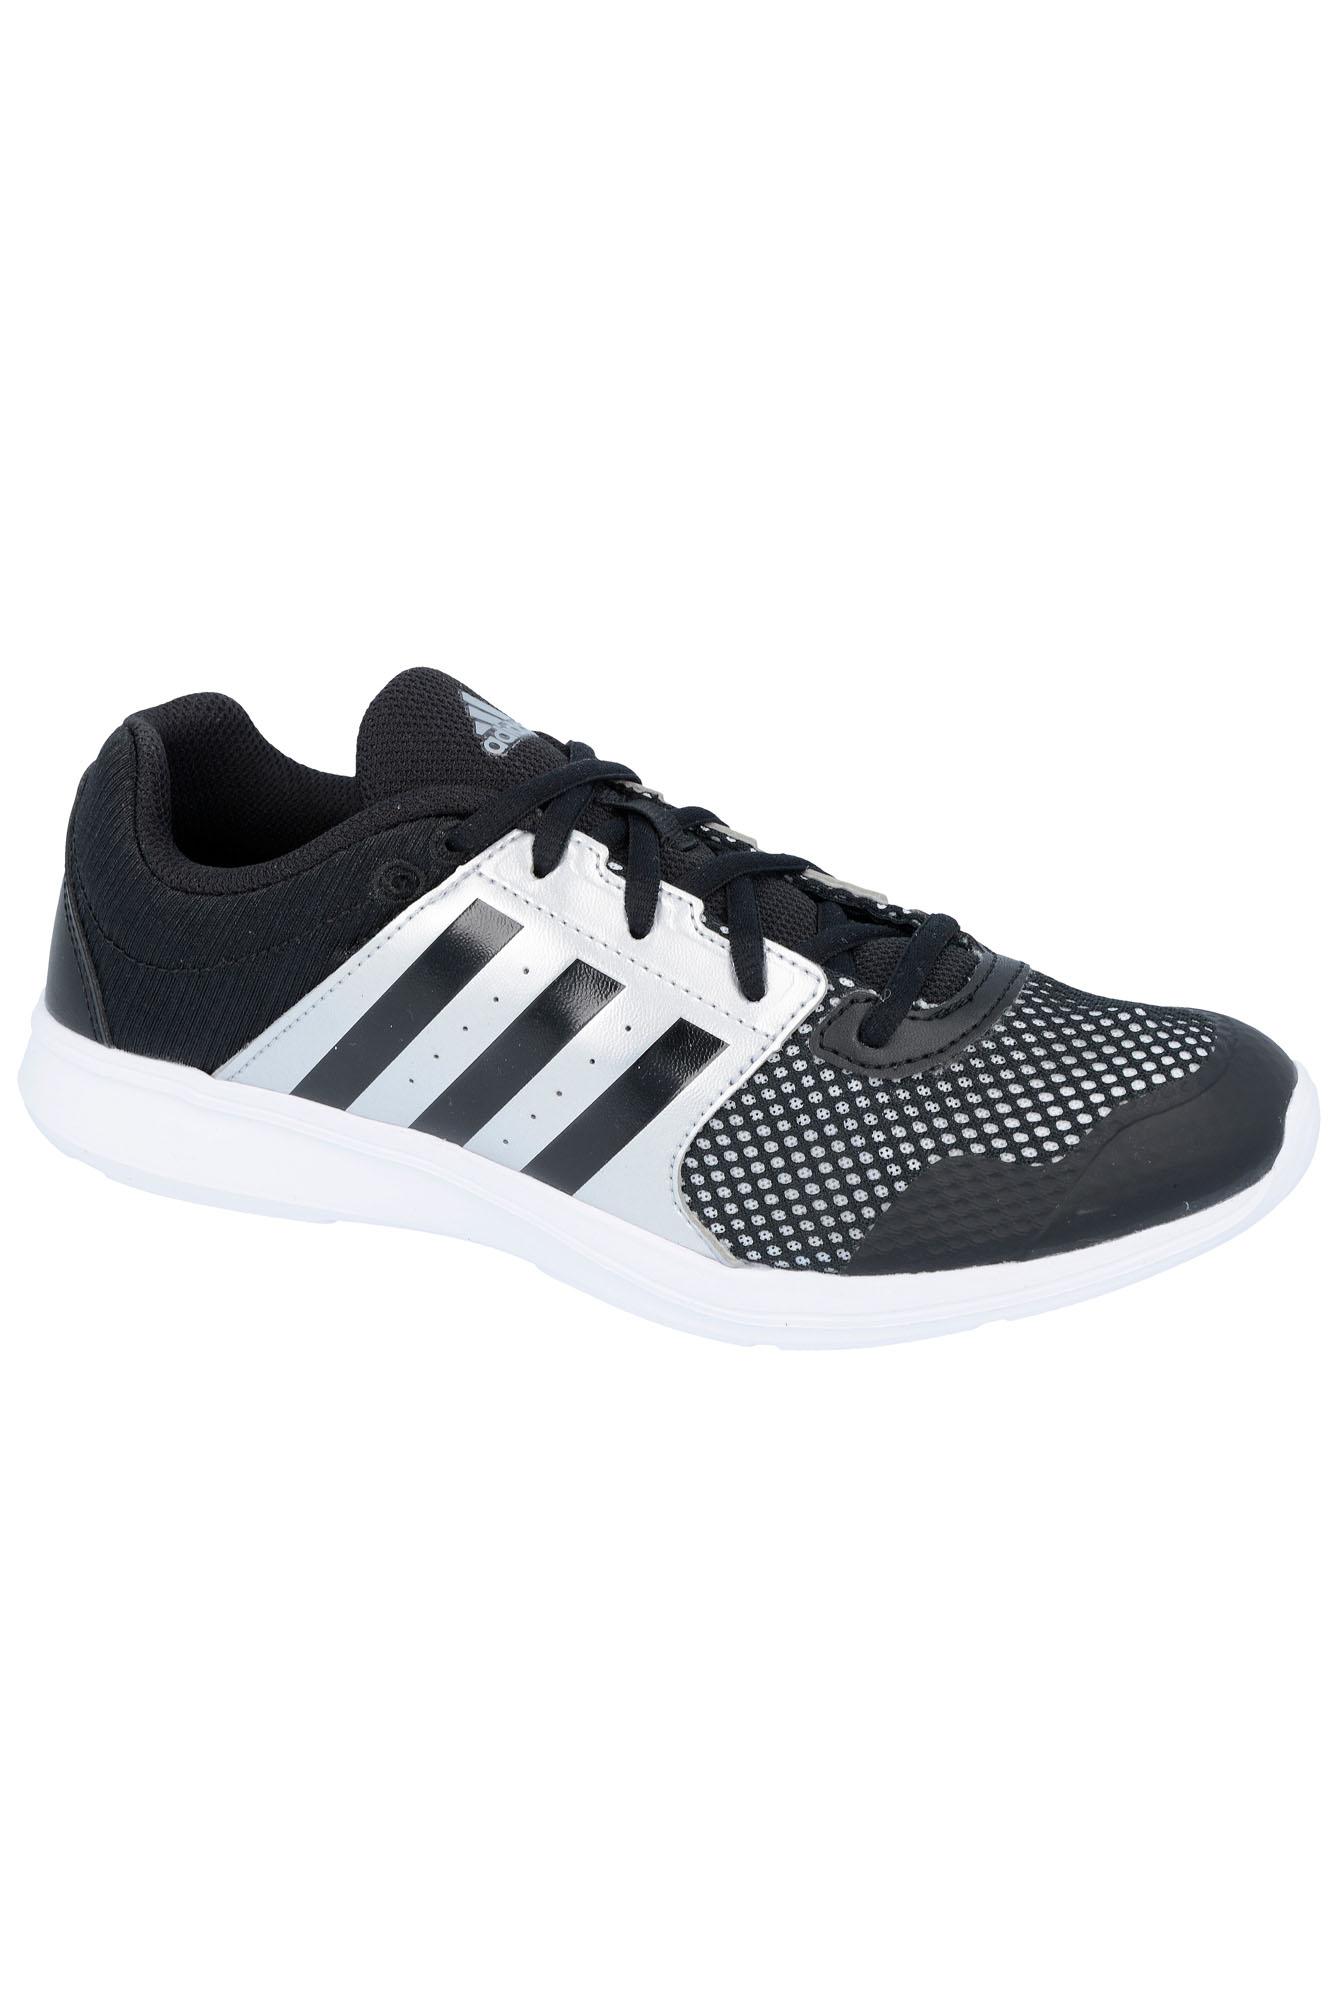 Buty adidas Essential Fun 2 BB1524 Treningowe Buty